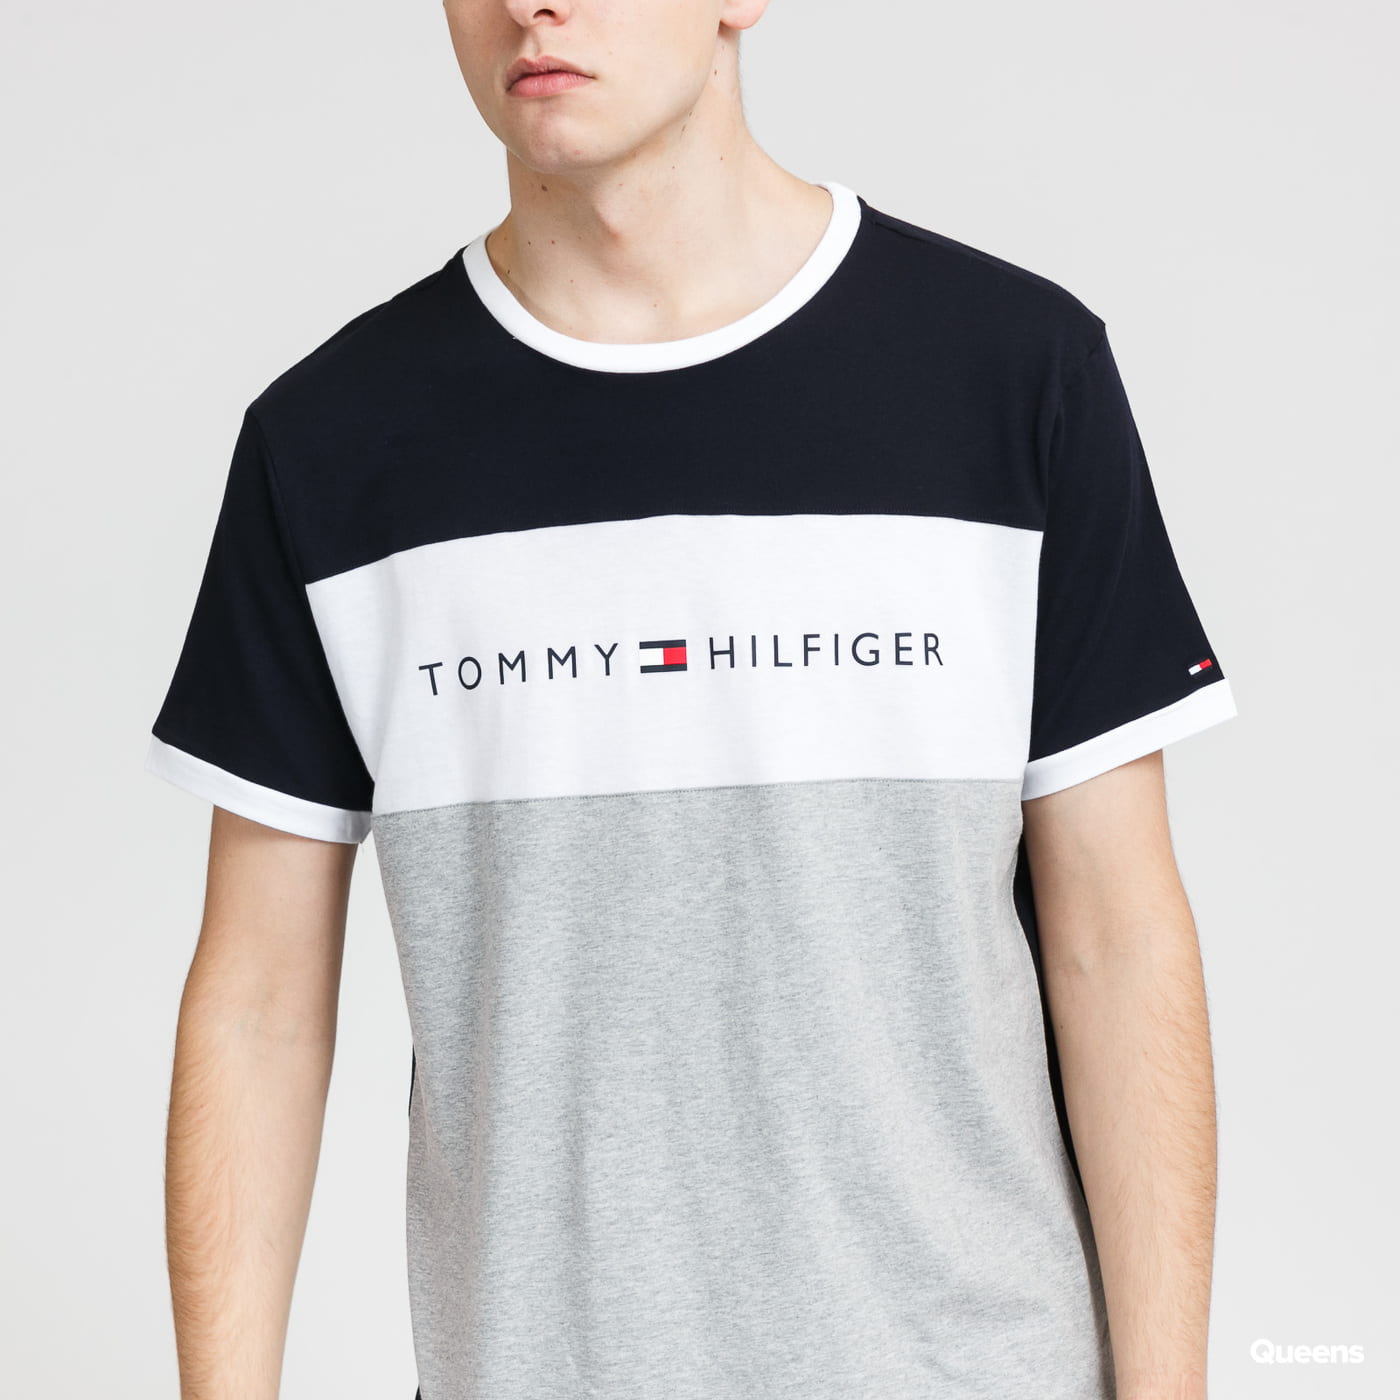 Tommy Hilfiger CN SS Tee Logo Flag melange šedé / bílé / navy